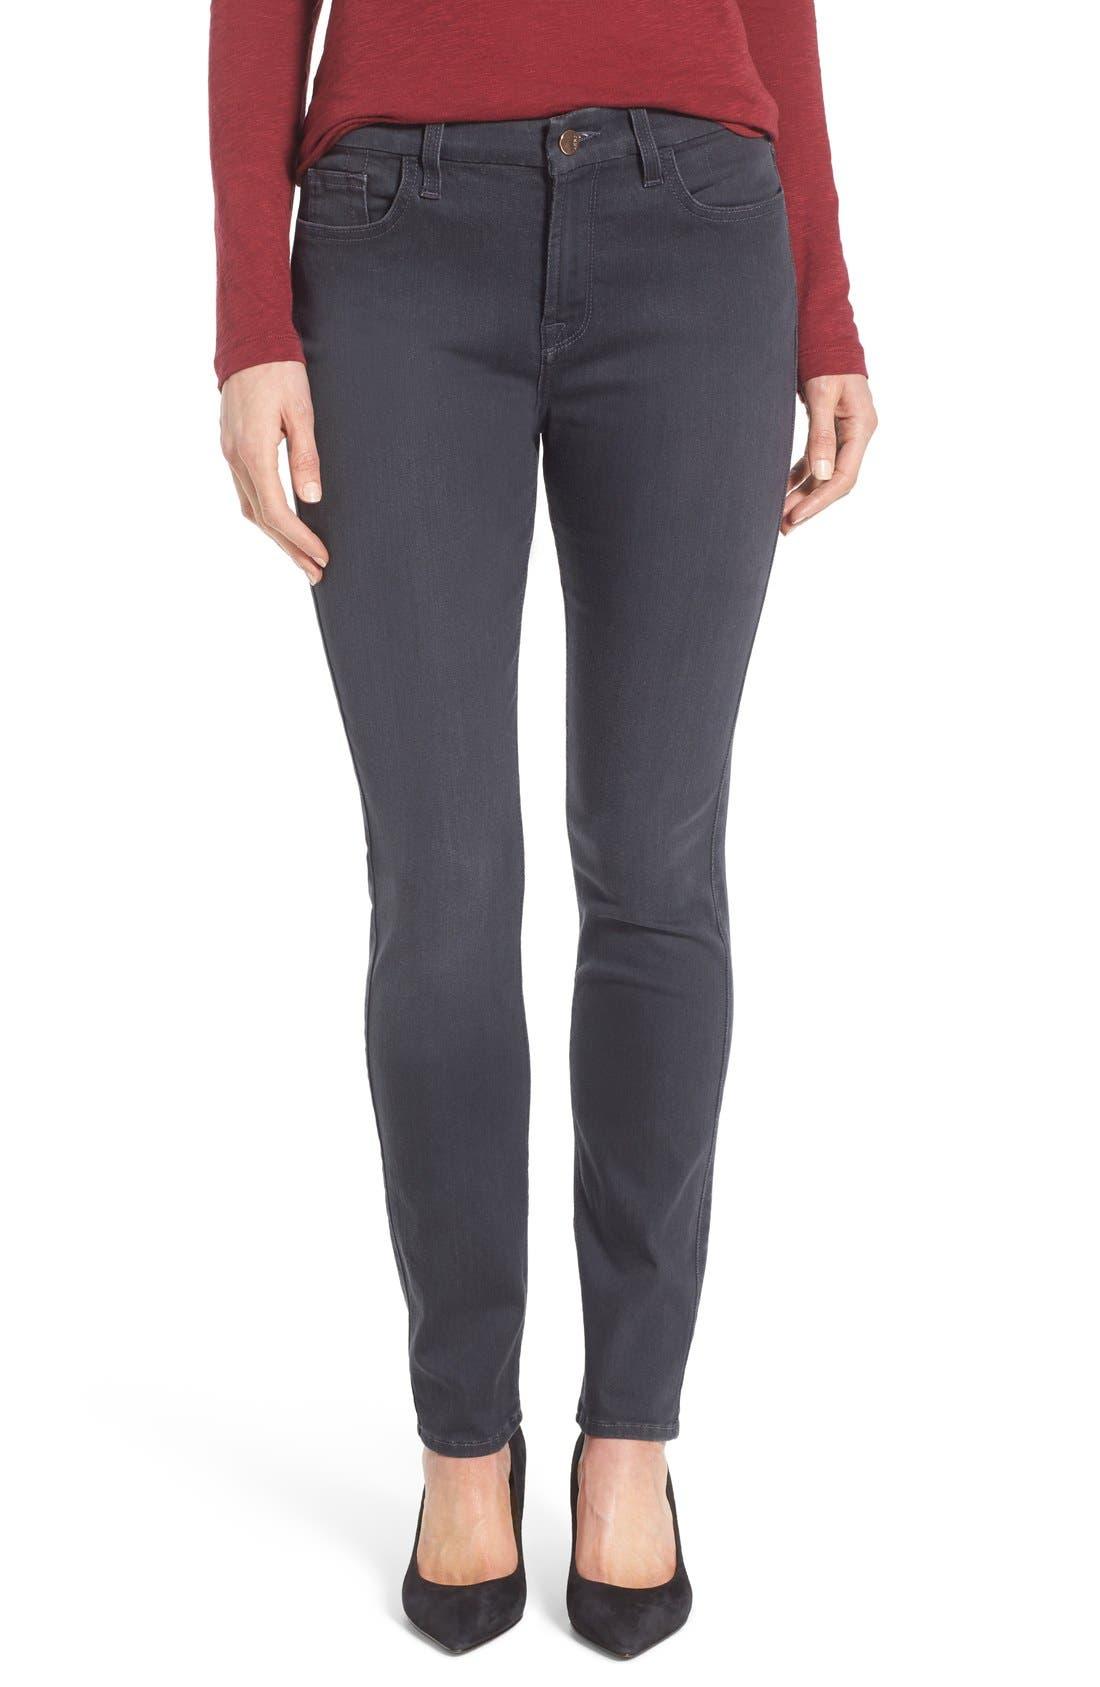 Stretch Skinny Jeans,                             Main thumbnail 1, color,                             Vapor Grey